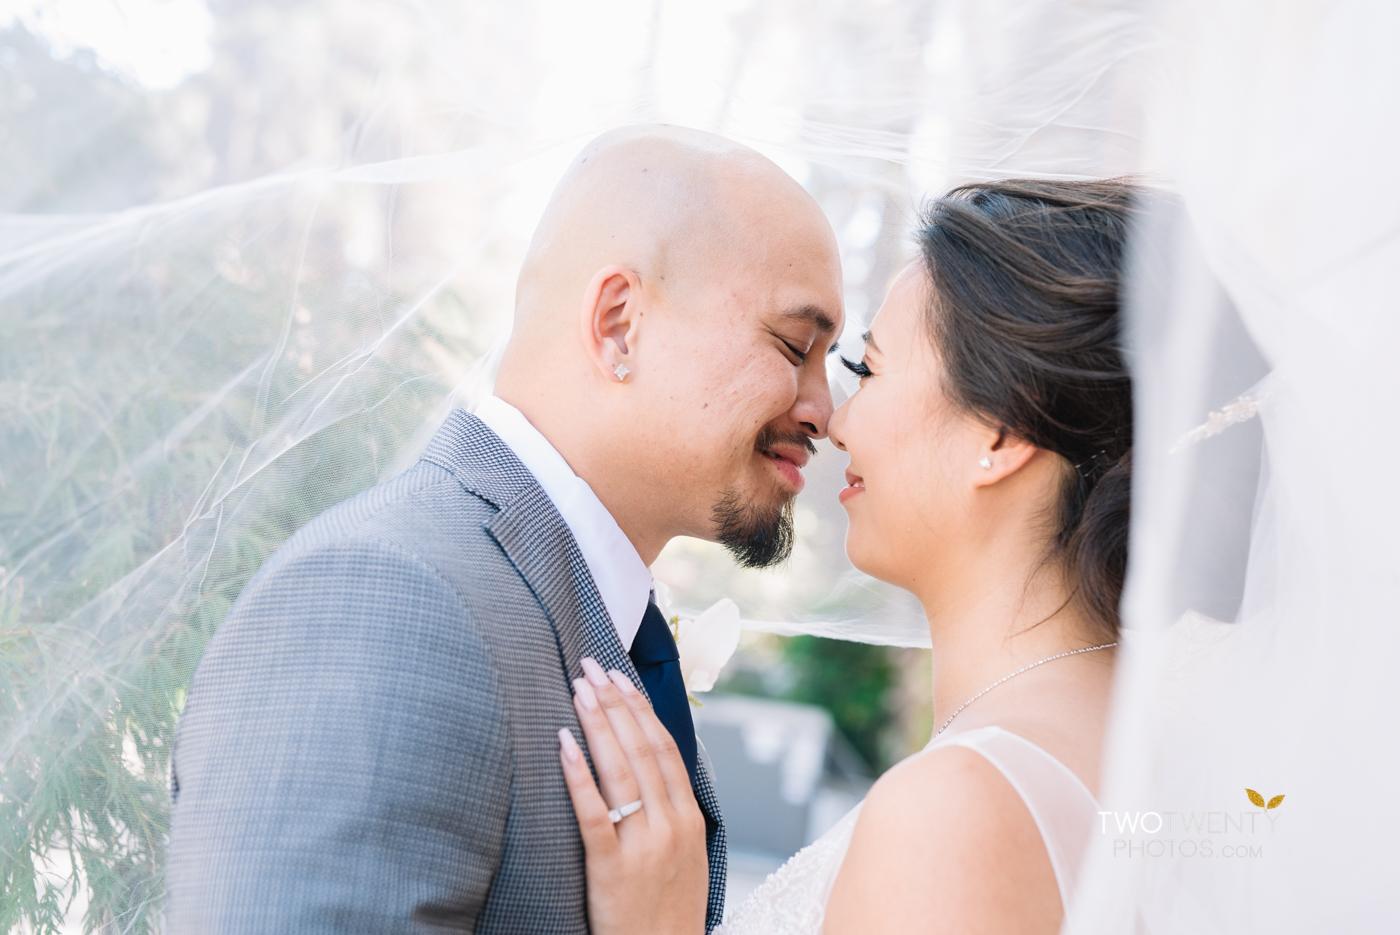 university-pacific-stockton-sacramento-wedding-photographer_-72